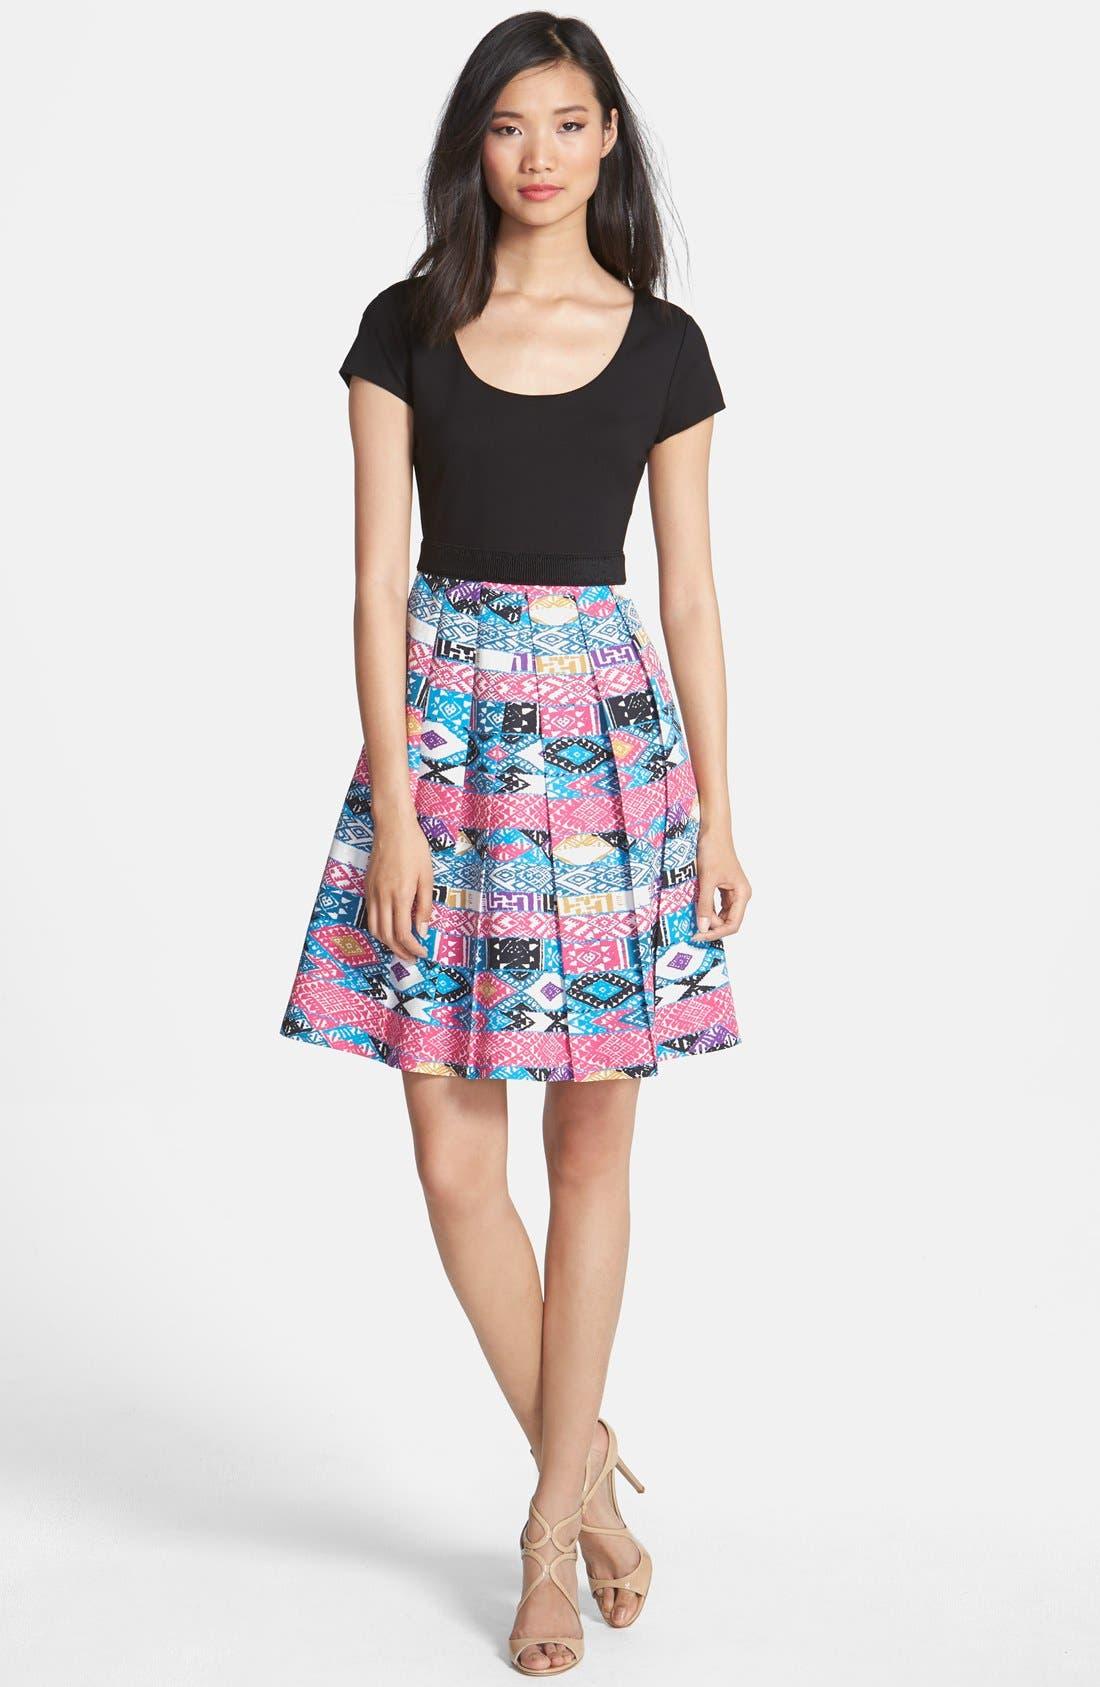 Main Image - Plenty by Tracy Reese 'Zoe' Print Skirt Fit & Flare Dress (Petite)